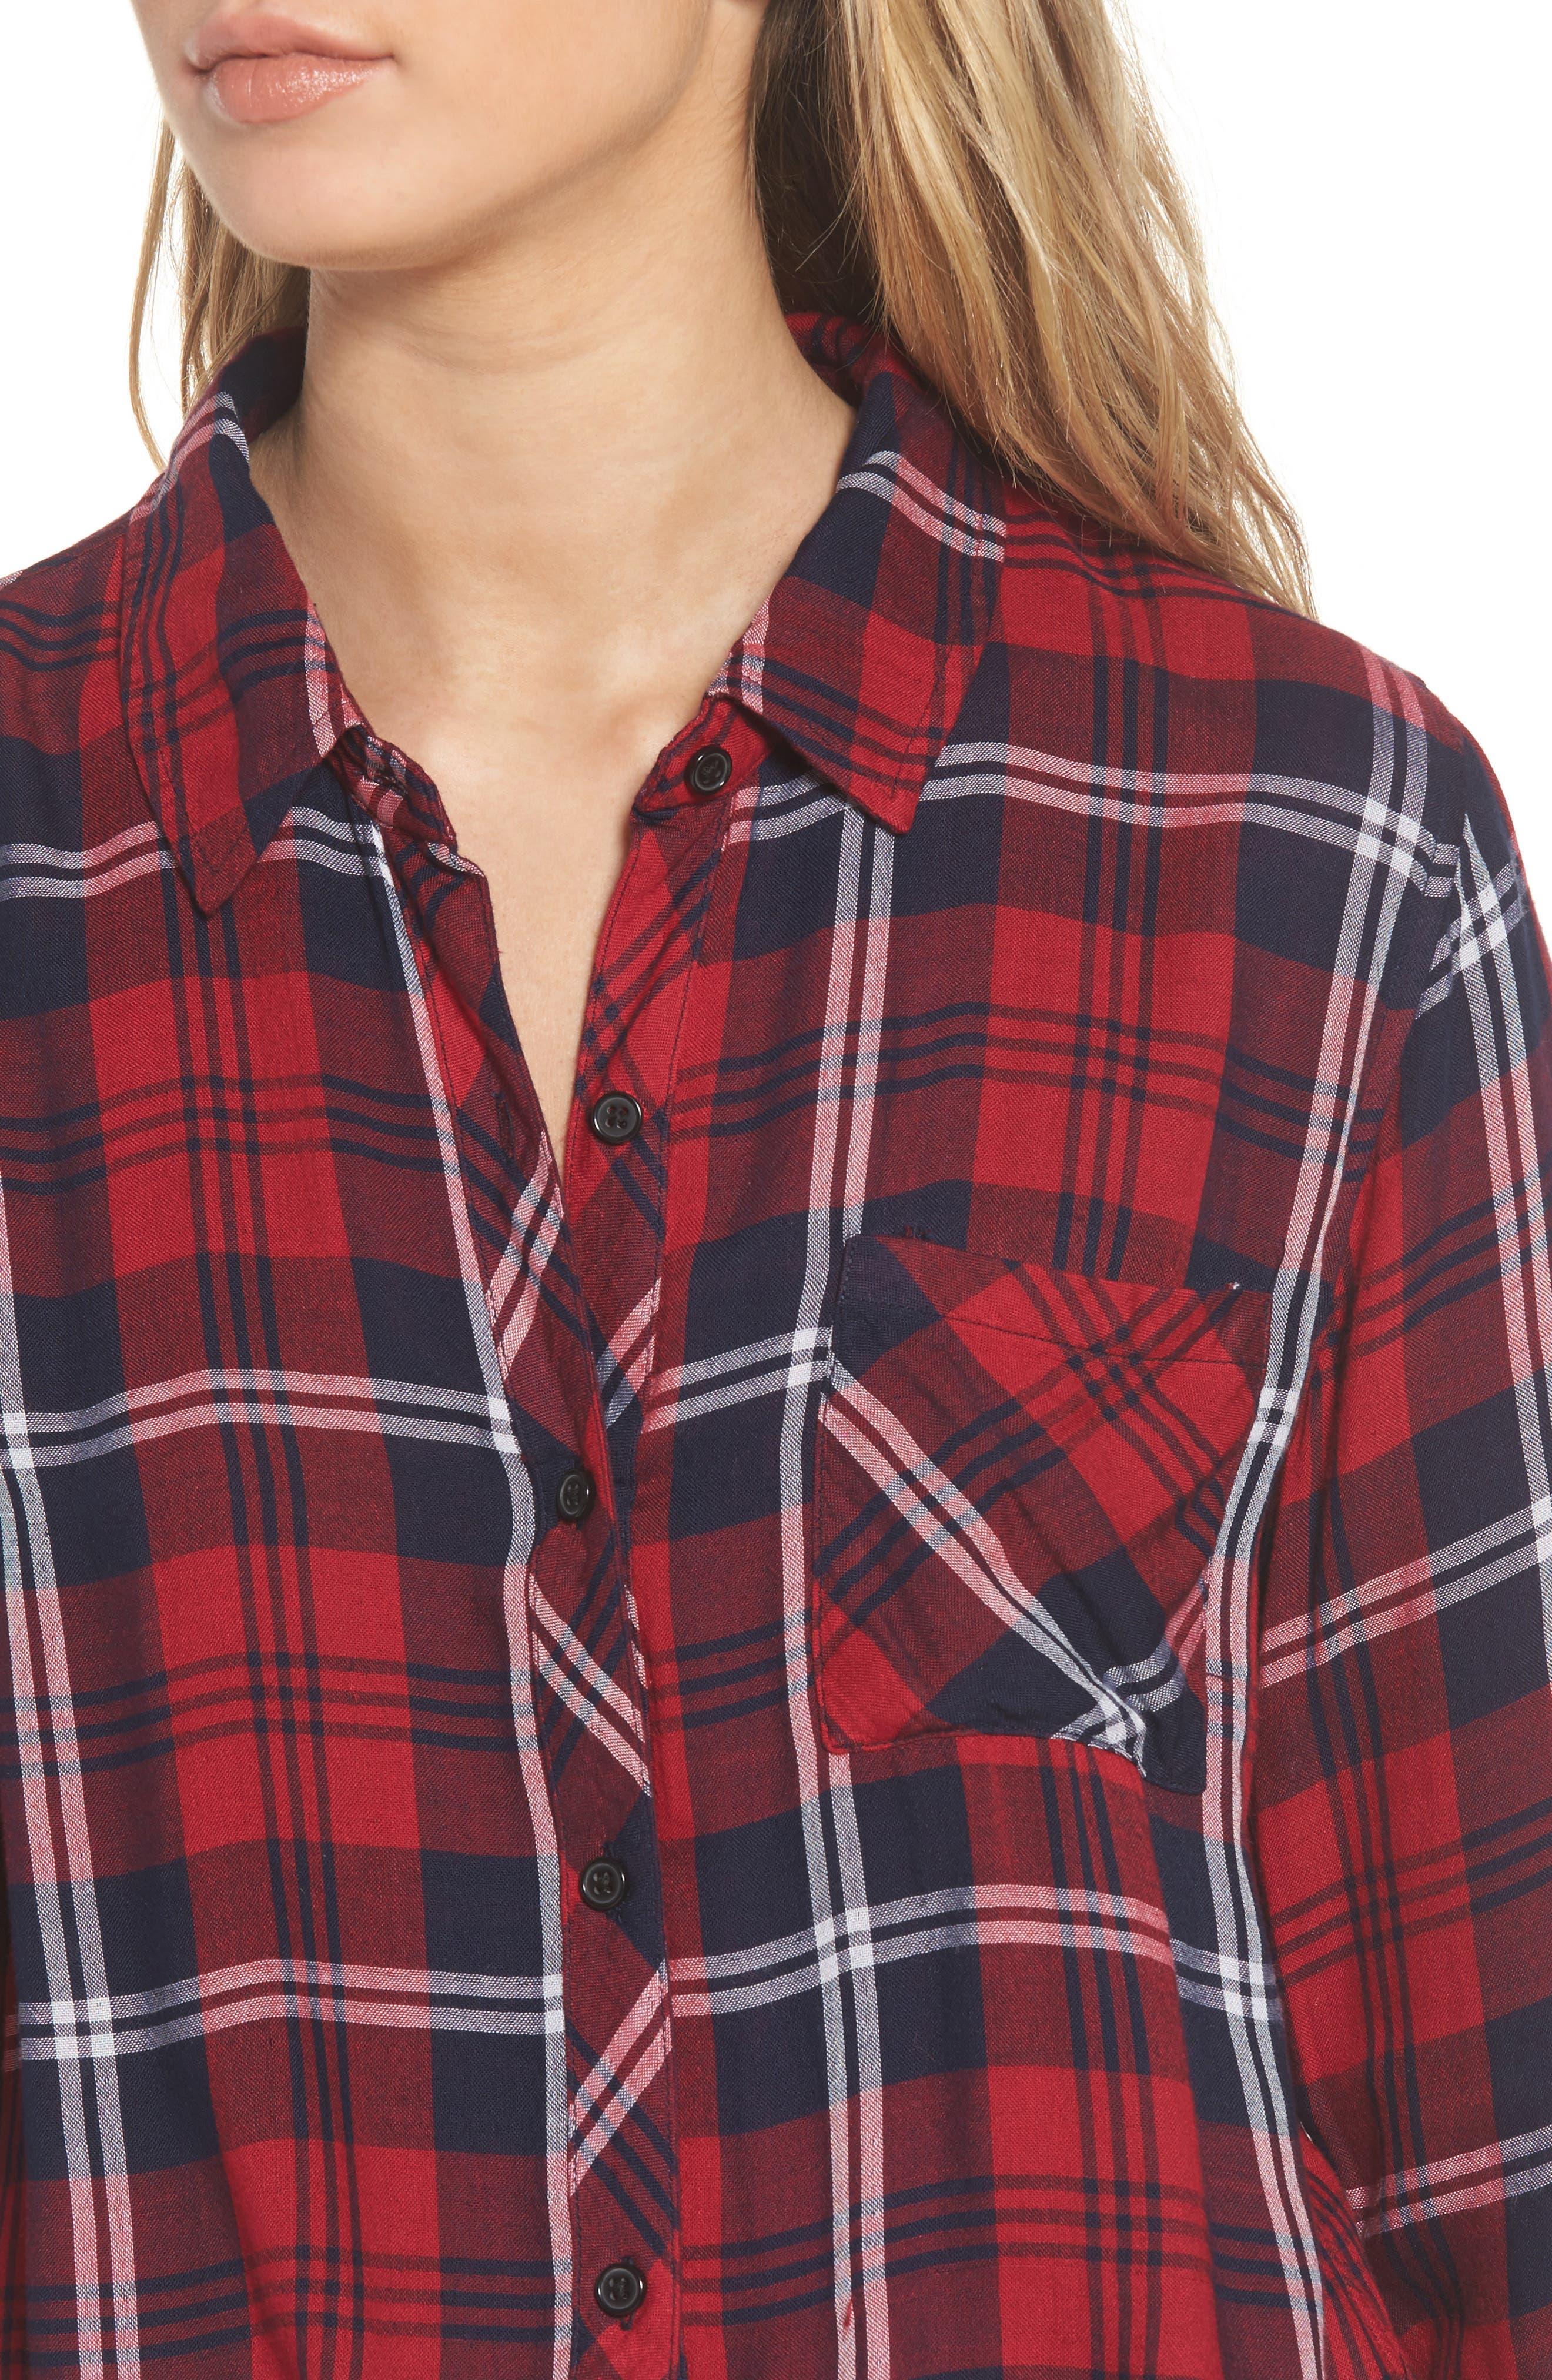 Taitum Plaid Shirt,                             Alternate thumbnail 4, color,                             622